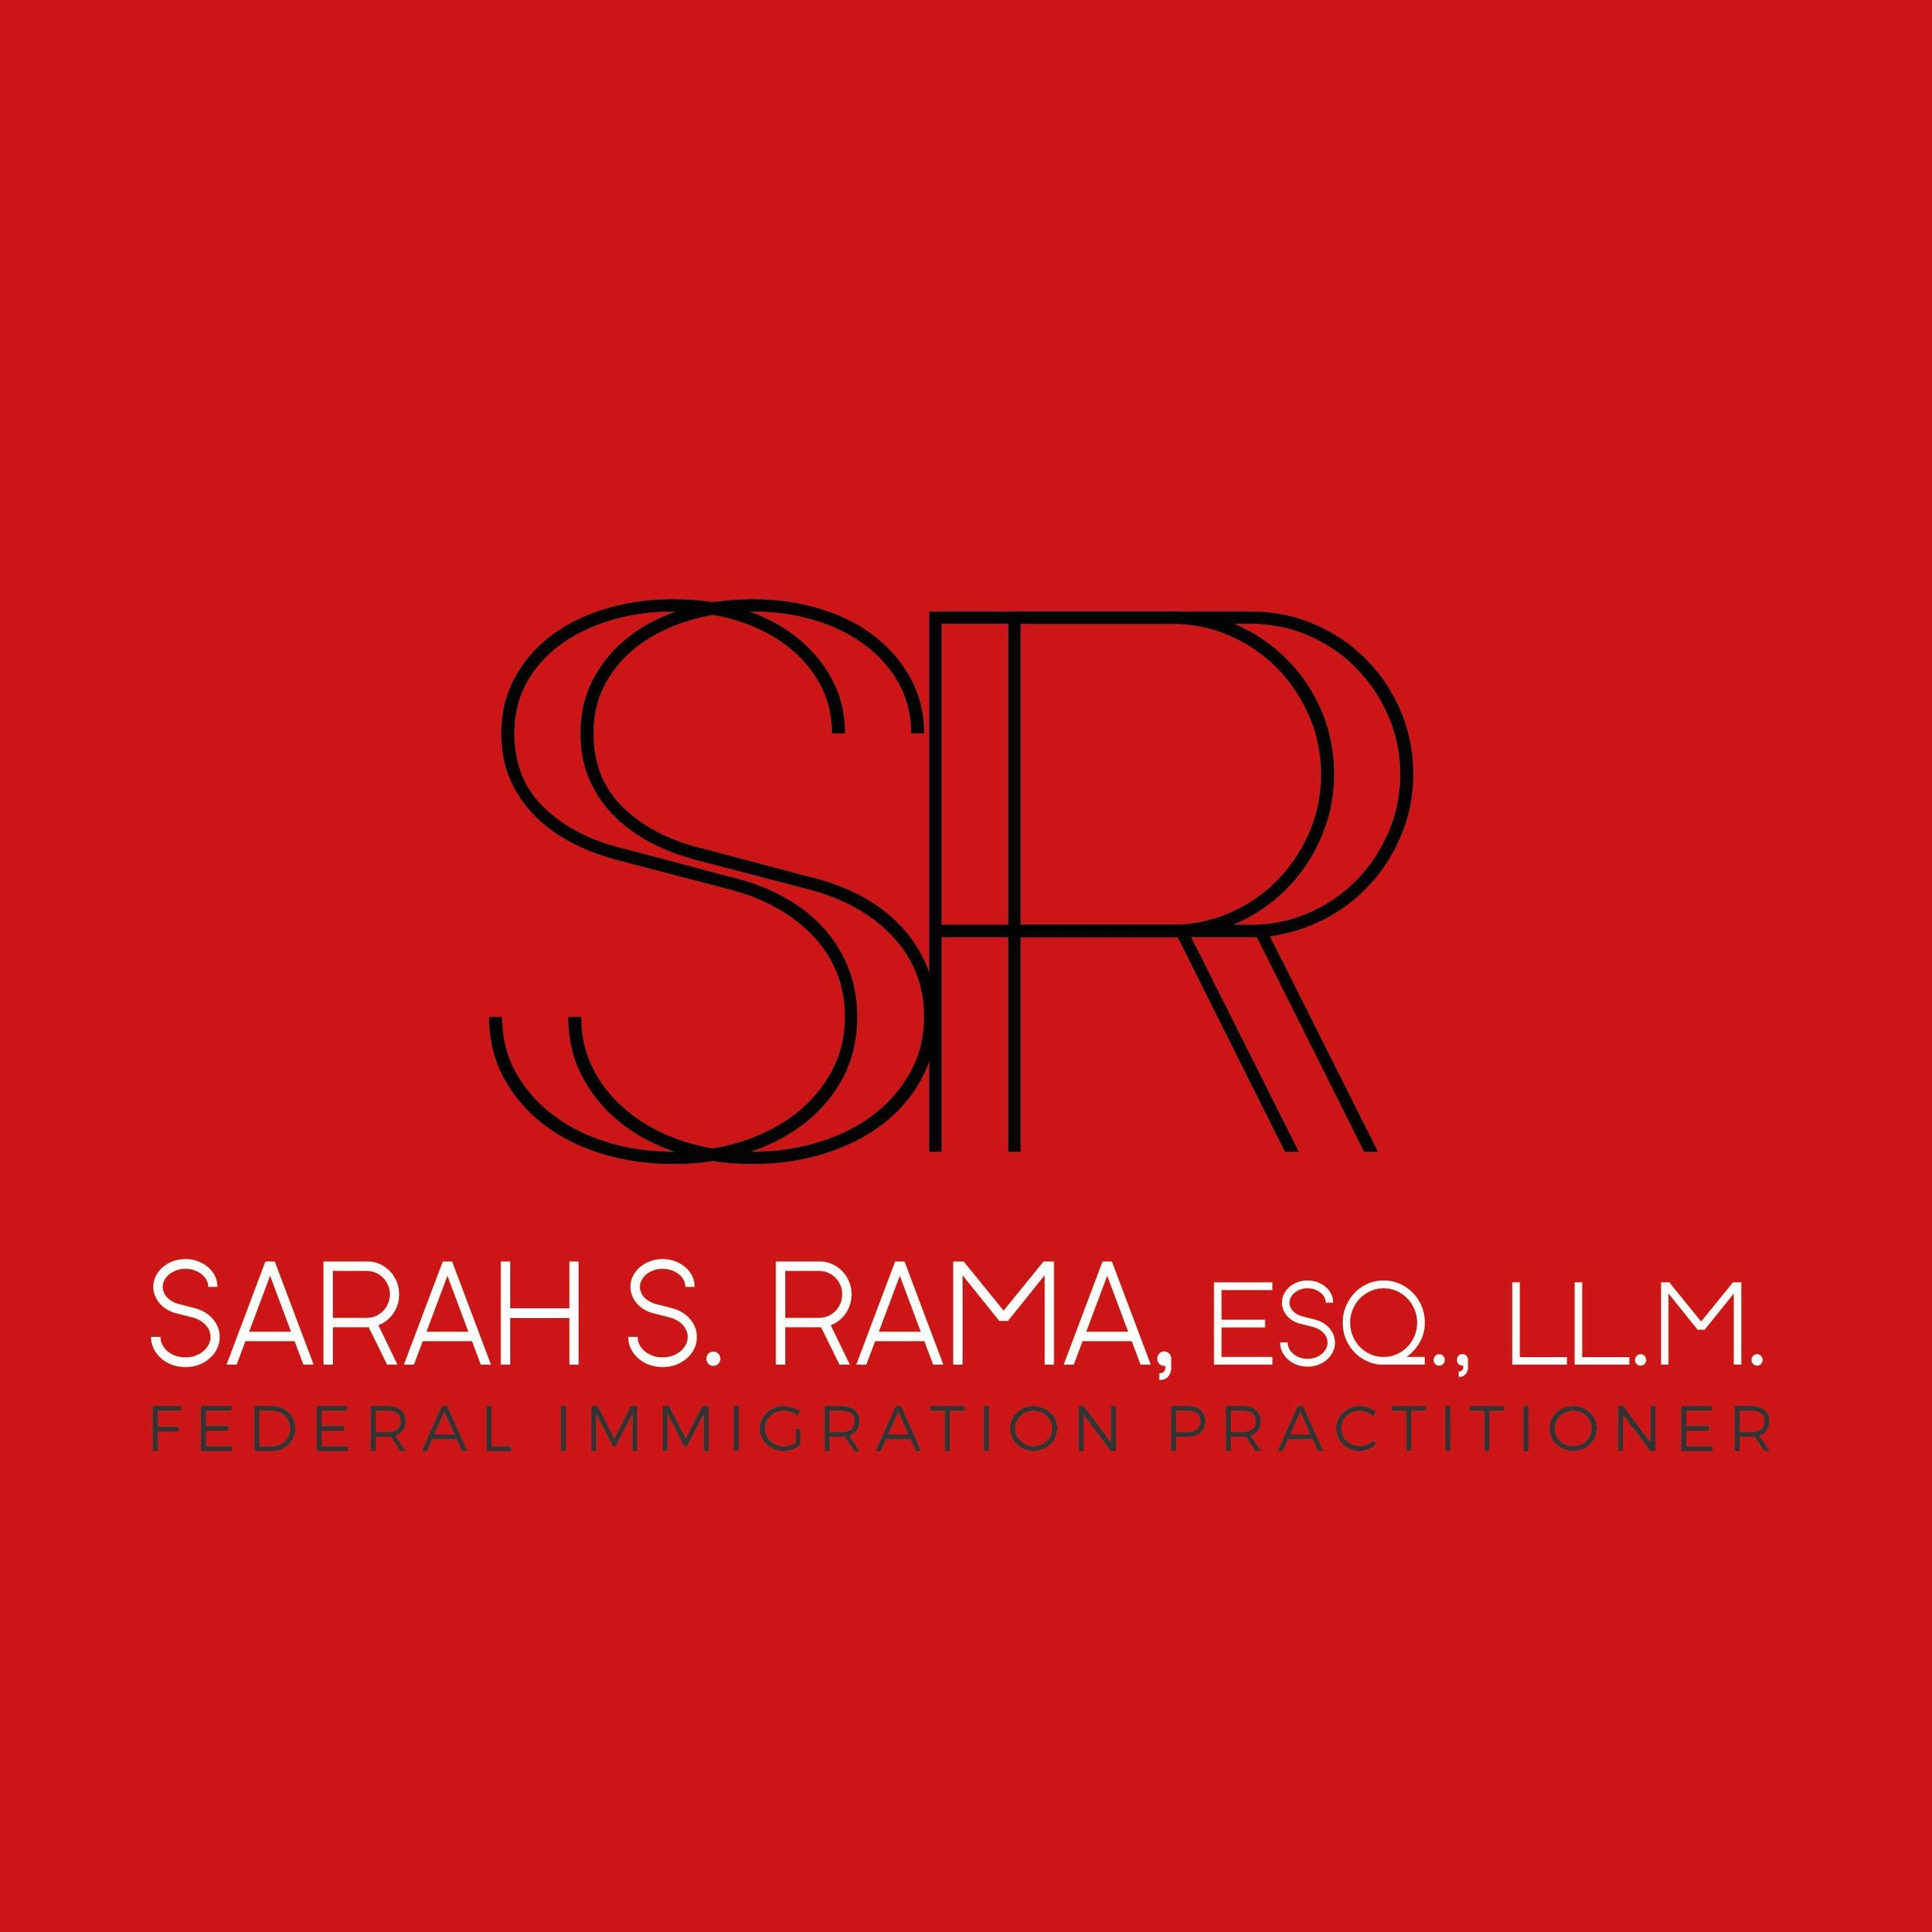 Sarah S. Rama, ESQ., LL.M. image 1